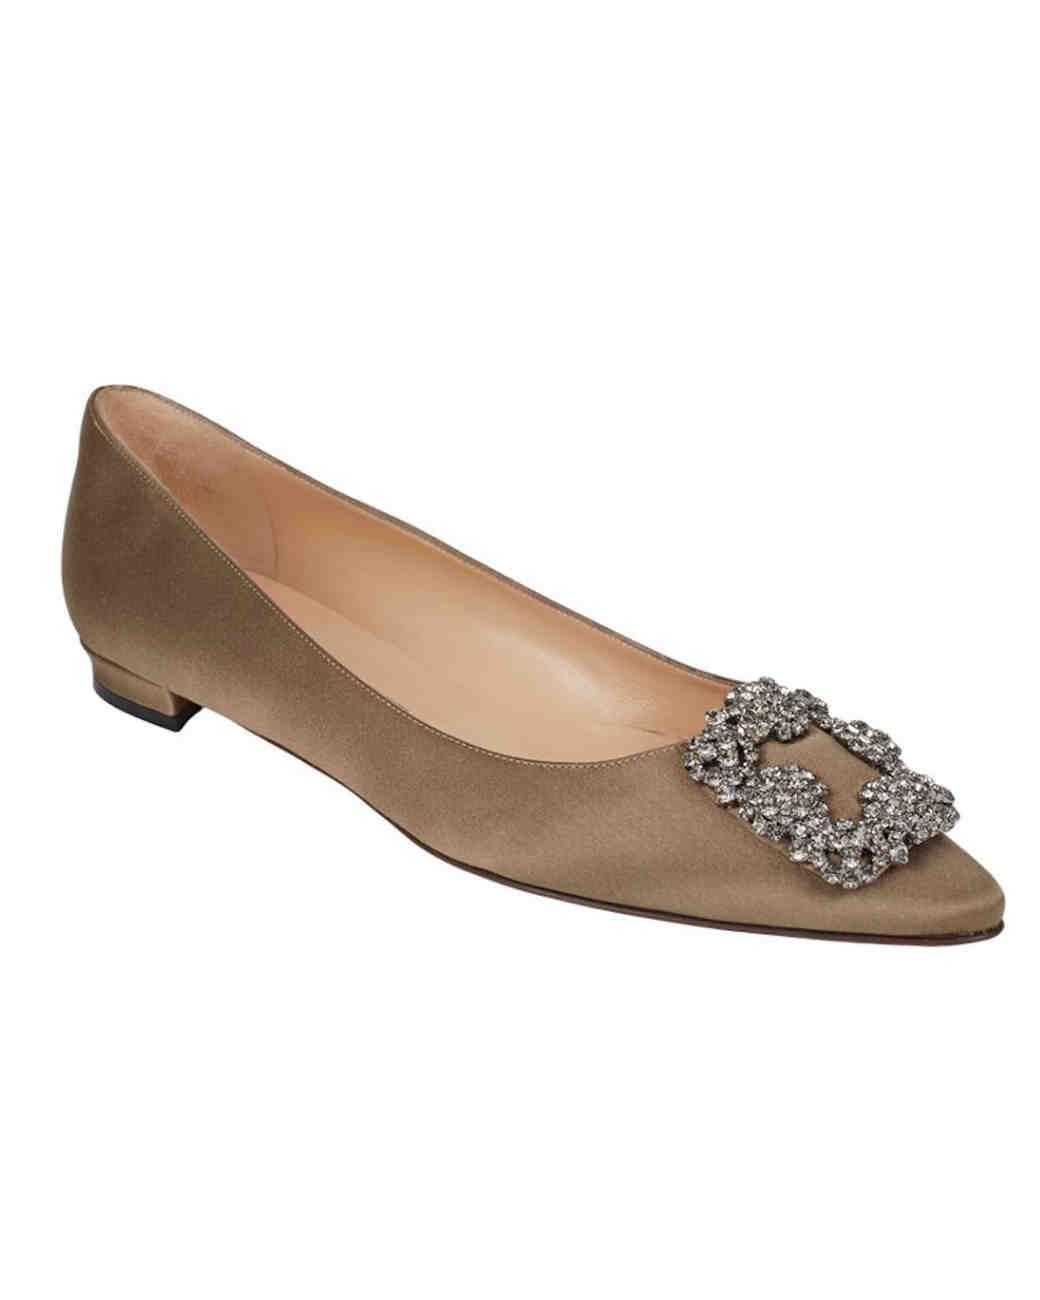 summer-wedding-shoes-manolo-blahnik-hangisi-flats-0515.jpg